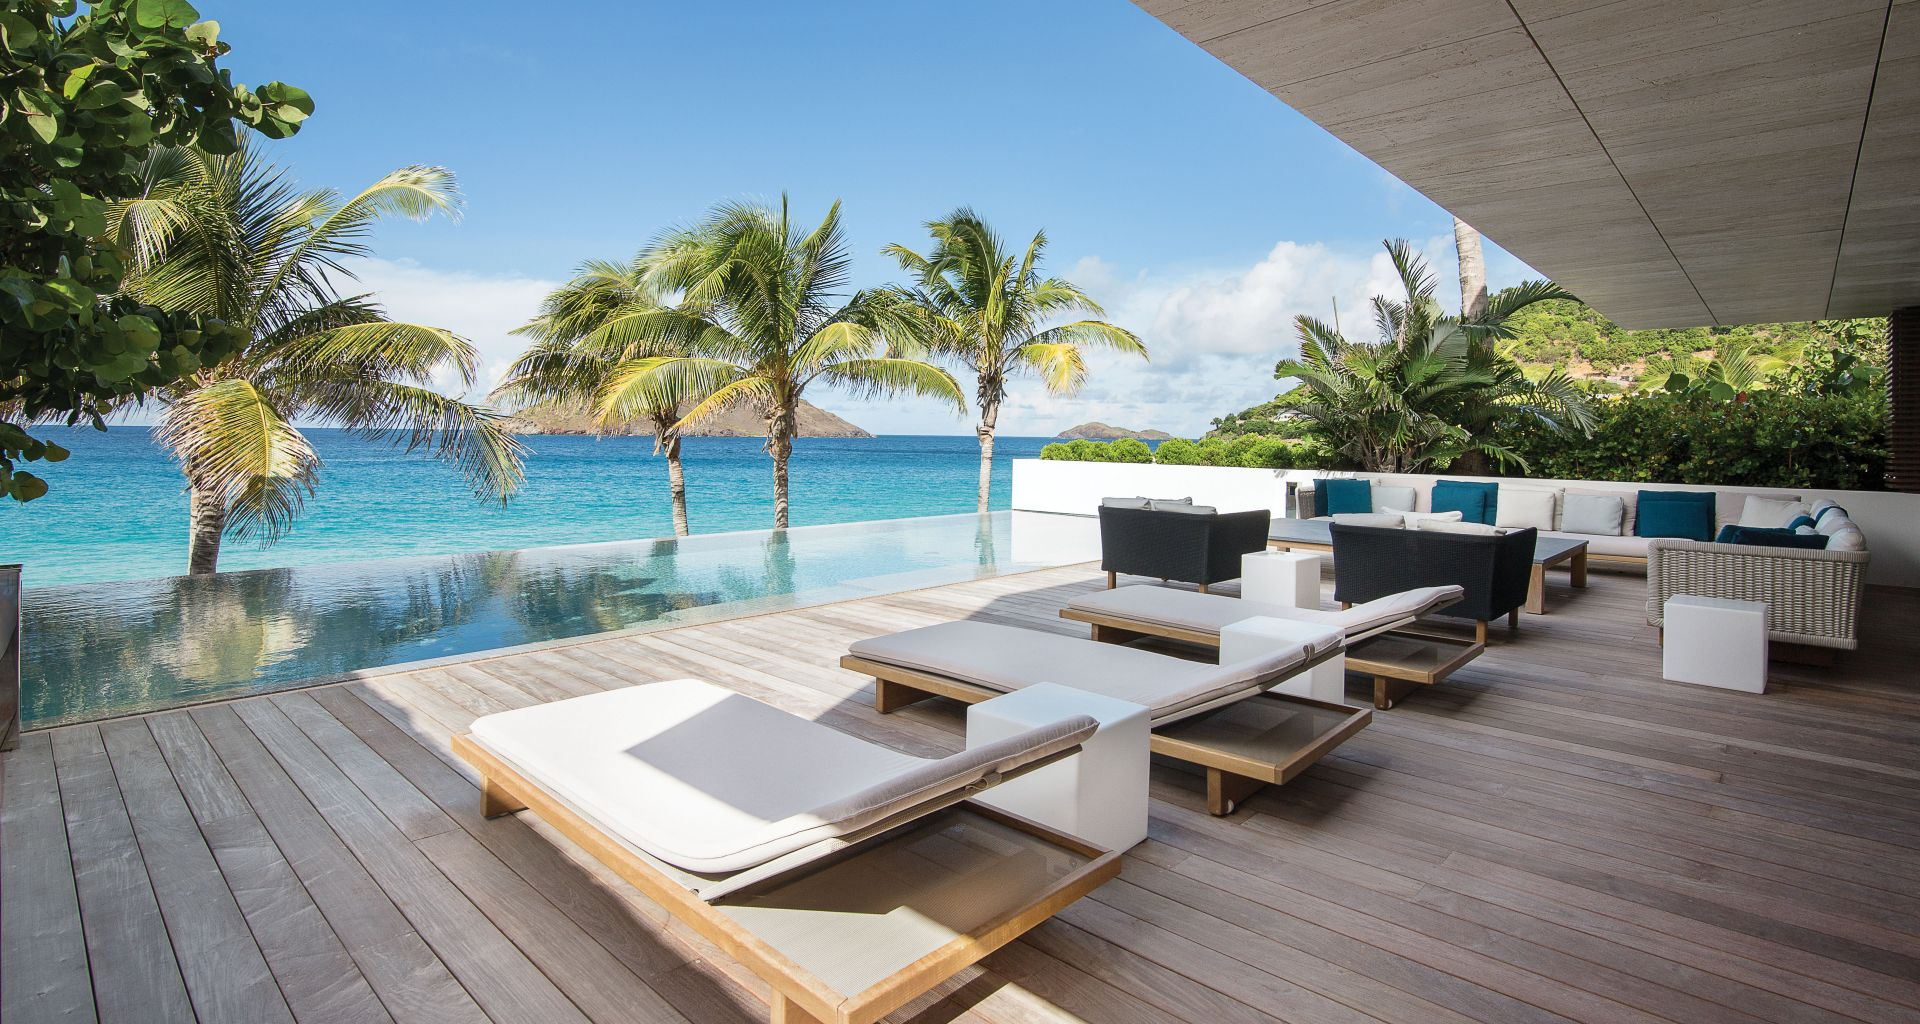 Villa Wake Up Vacances SaintBarth Carabes  Casol Villas France